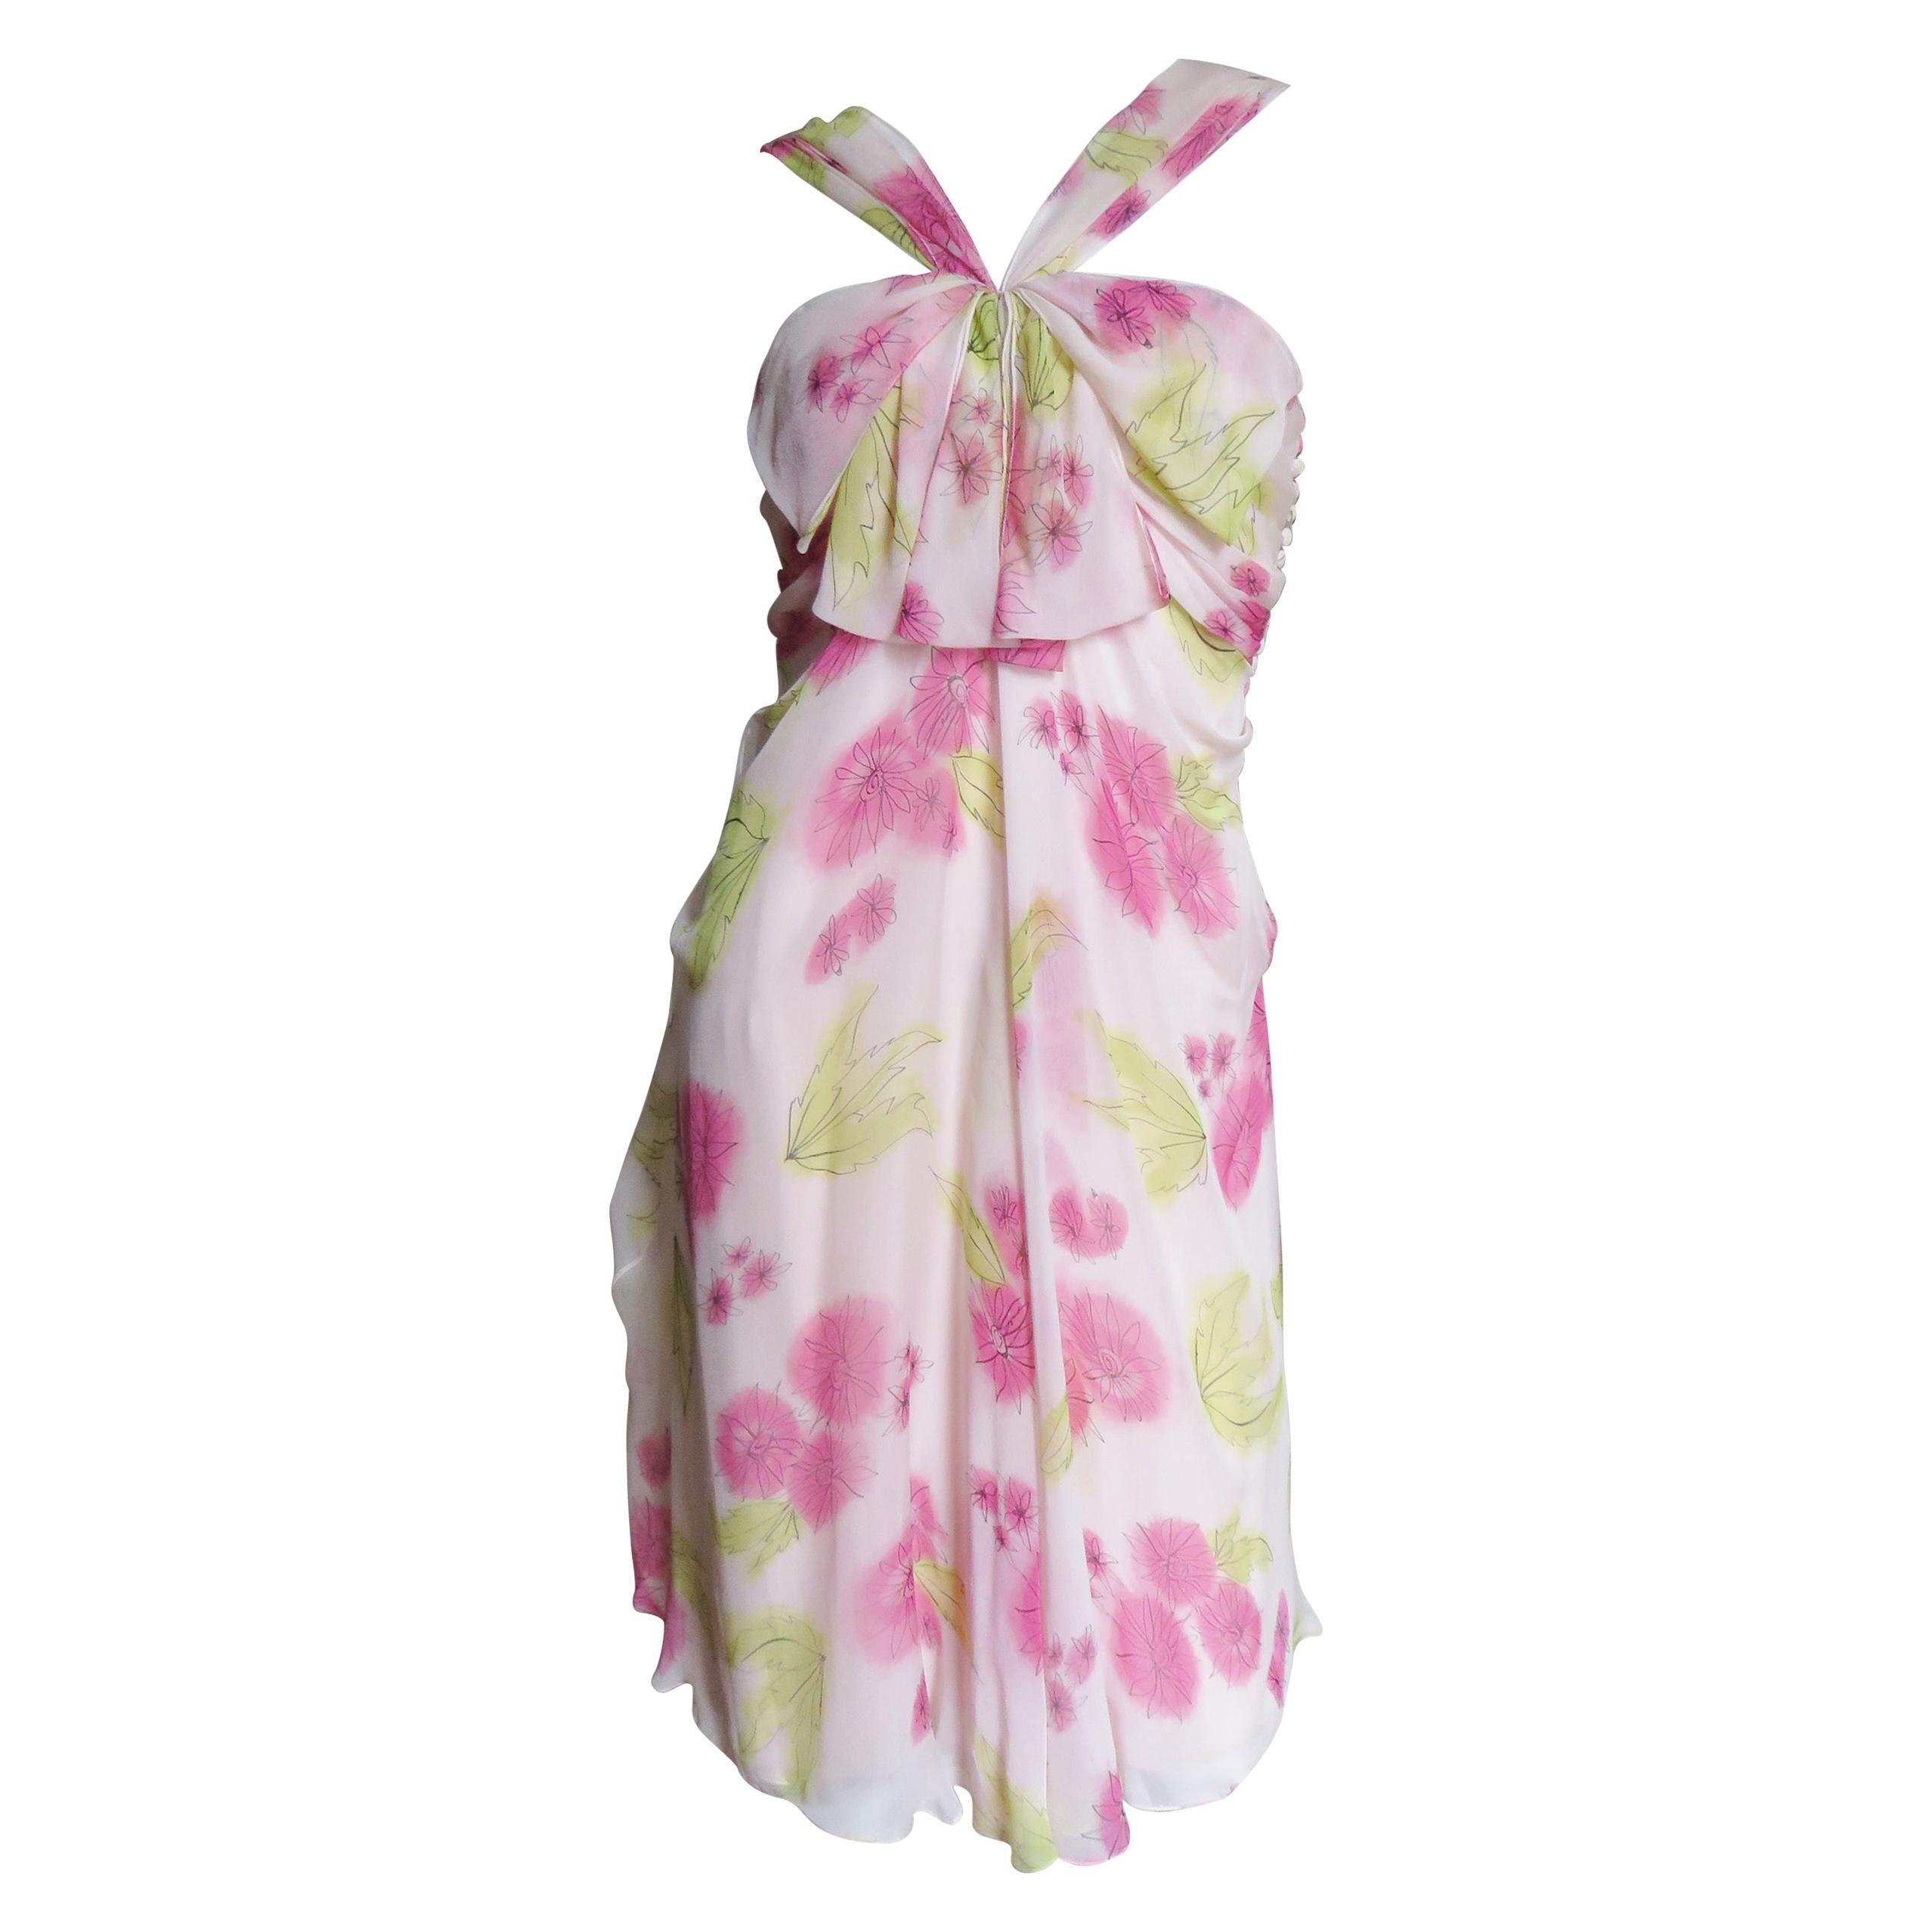 John Galliano for Christian Dior Pink Silk Flower Dress